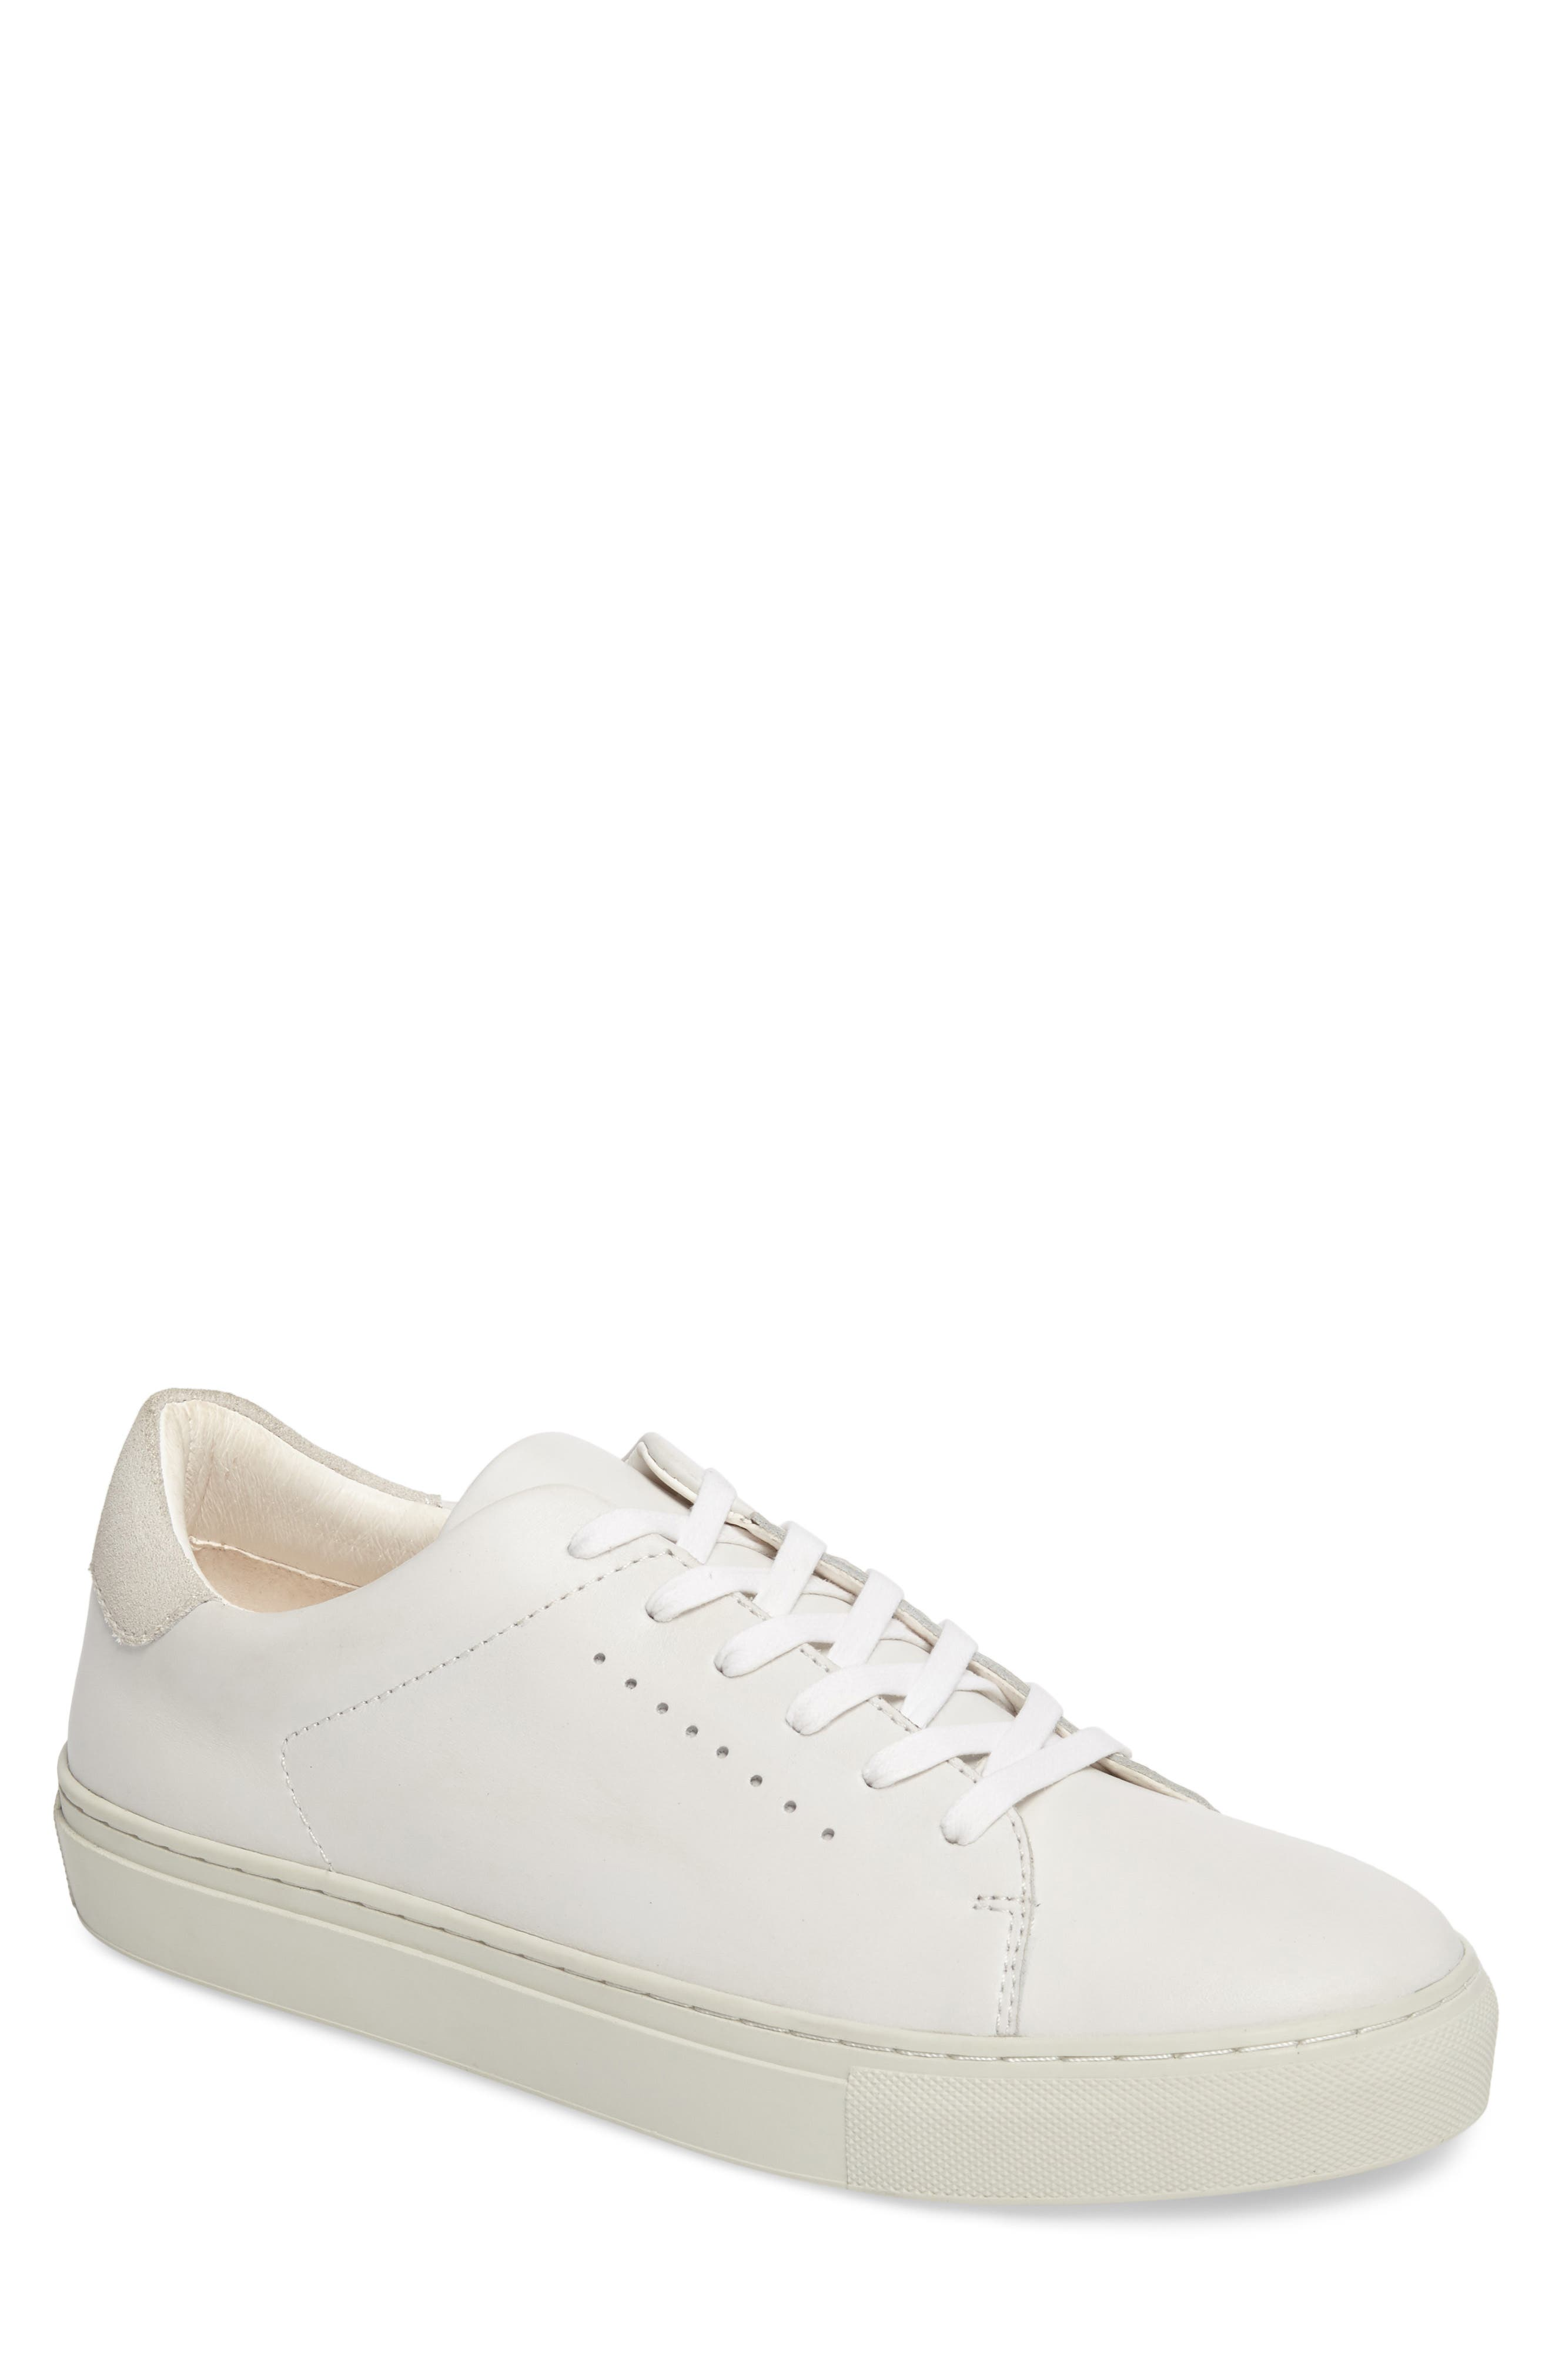 Desmond Sneaker,                             Main thumbnail 1, color,                             WHITE LEATHER